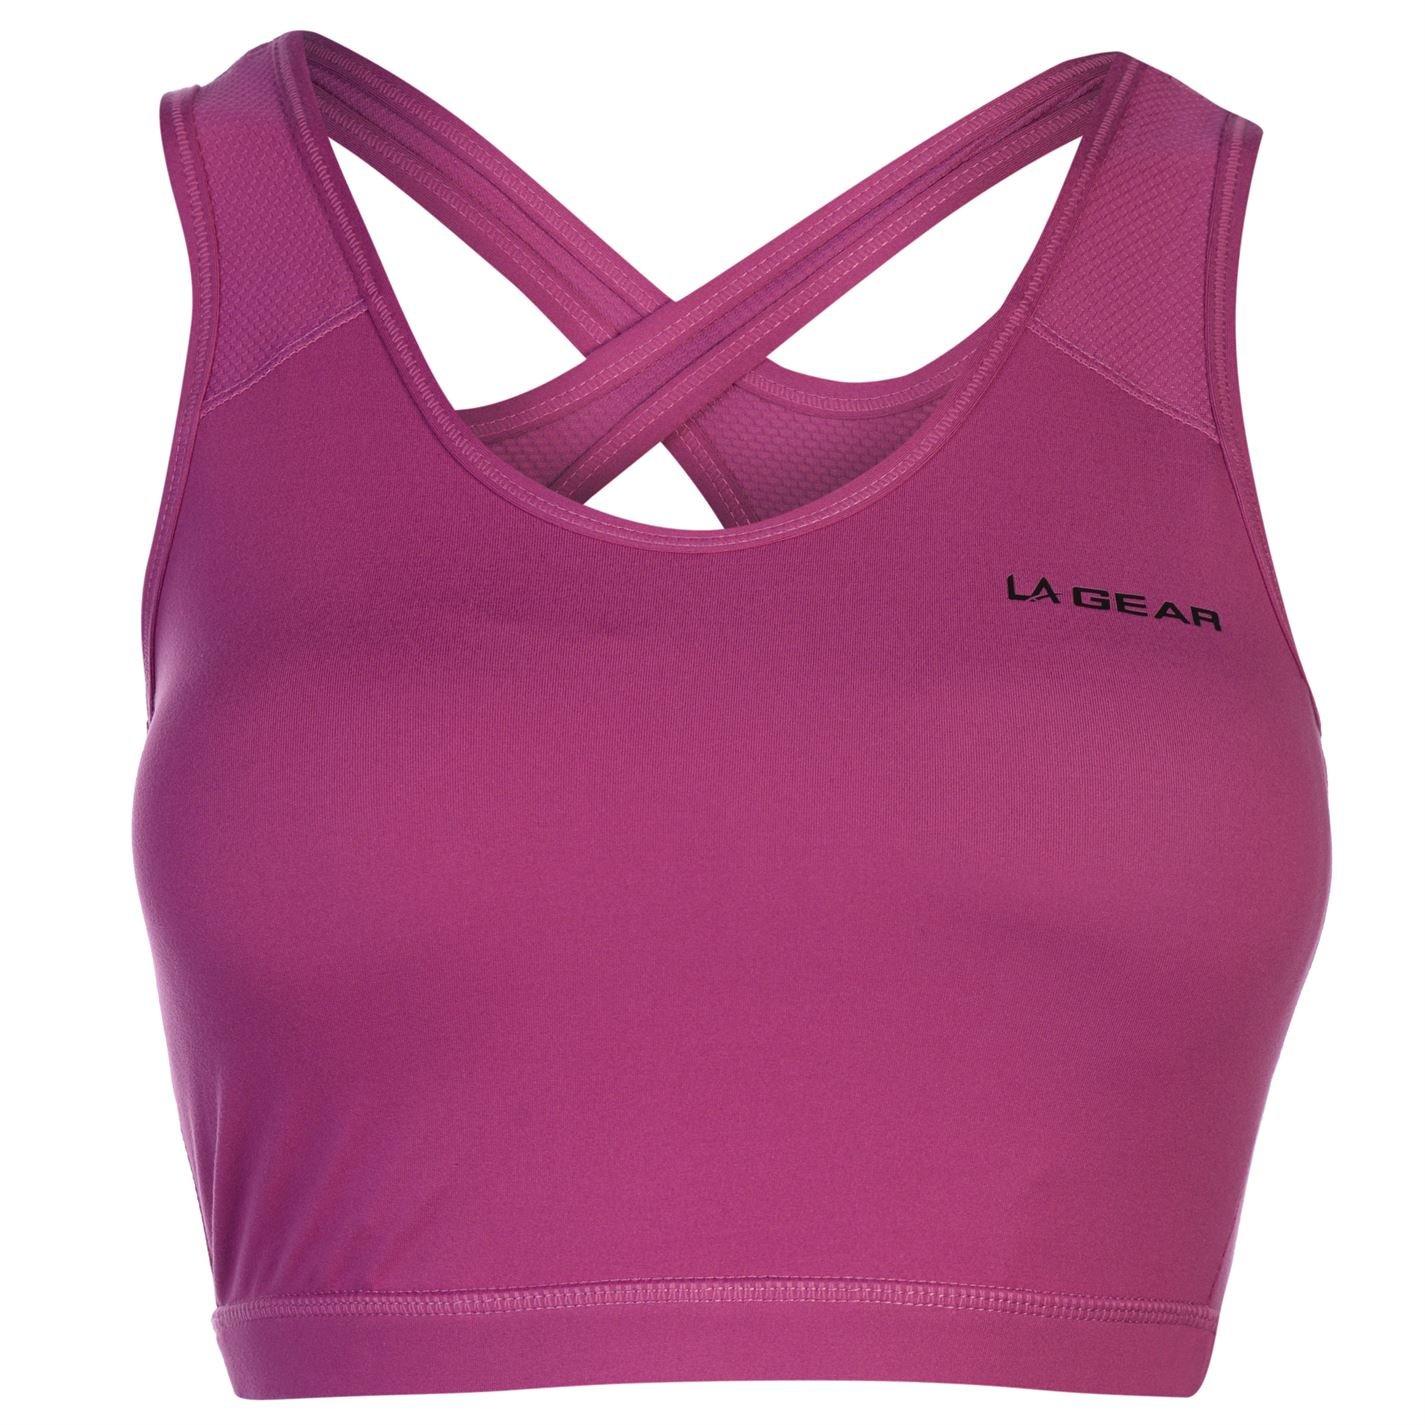 9839ab3085679 LA Gear Womens Cropped Sports Bra  Amazon.co.uk  Clothing